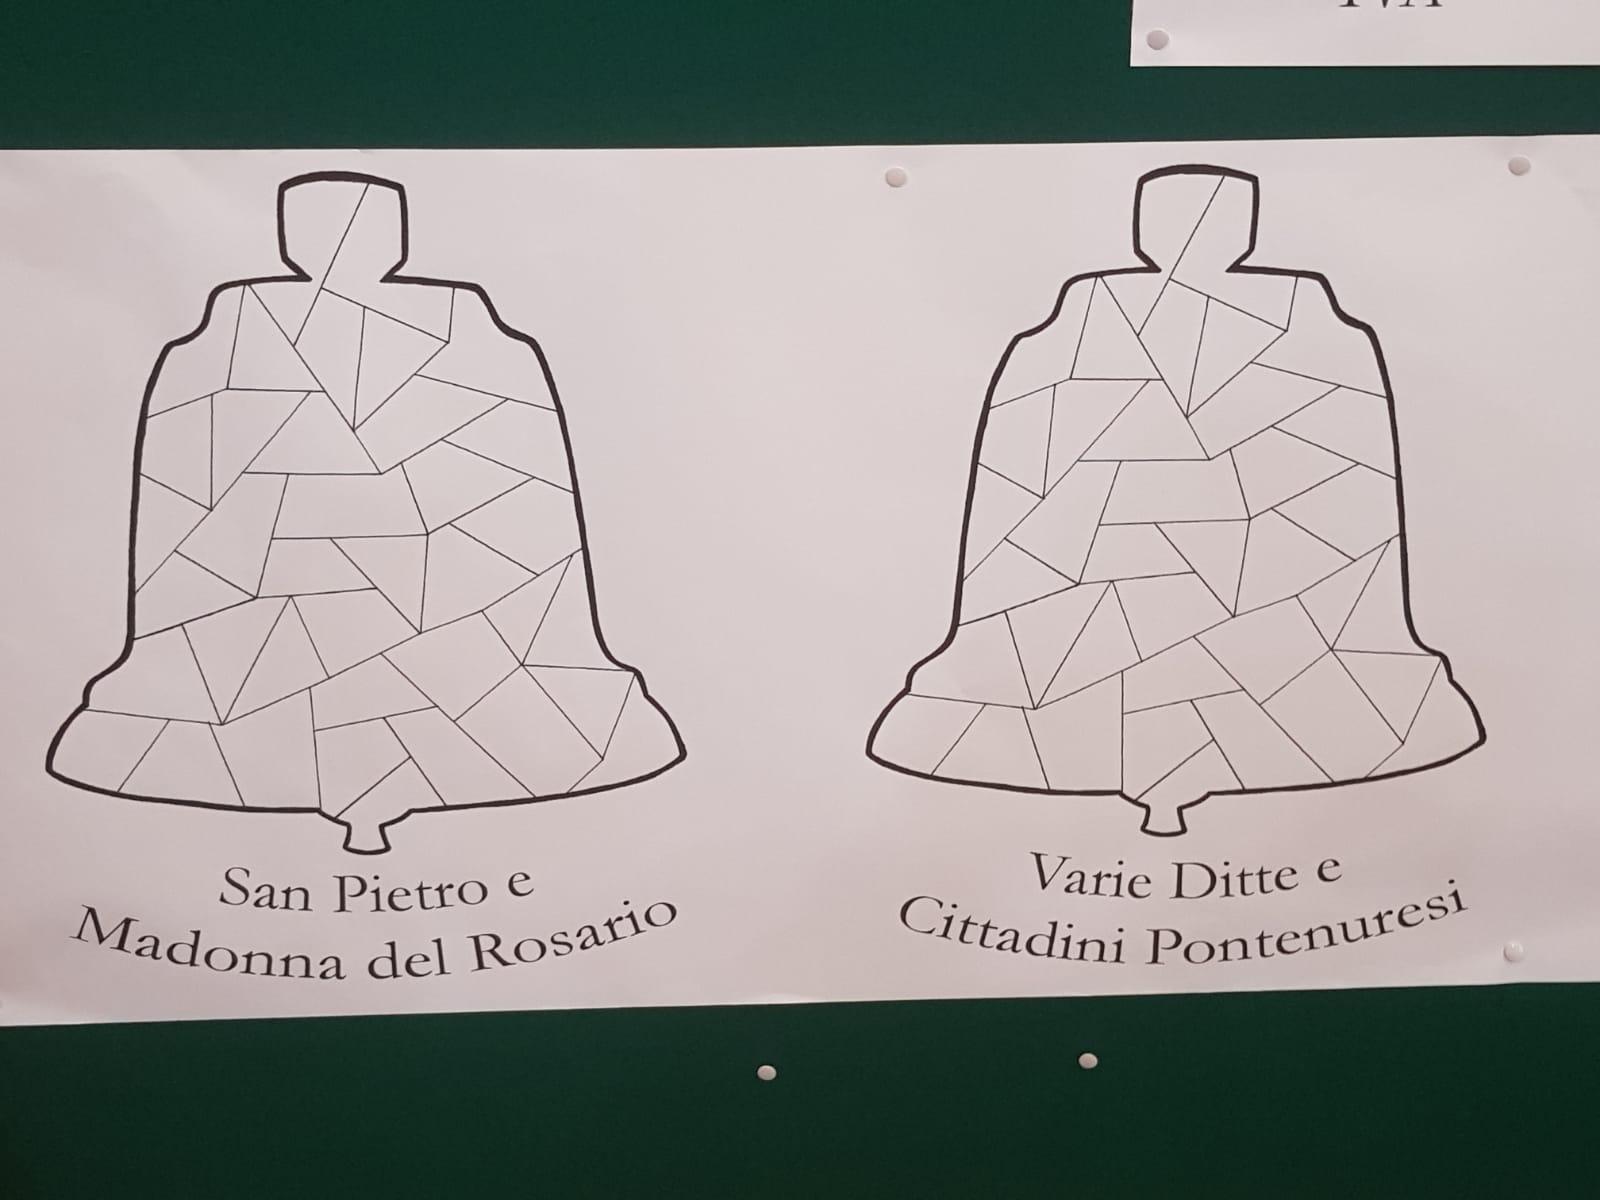 Cartellone campane (4)